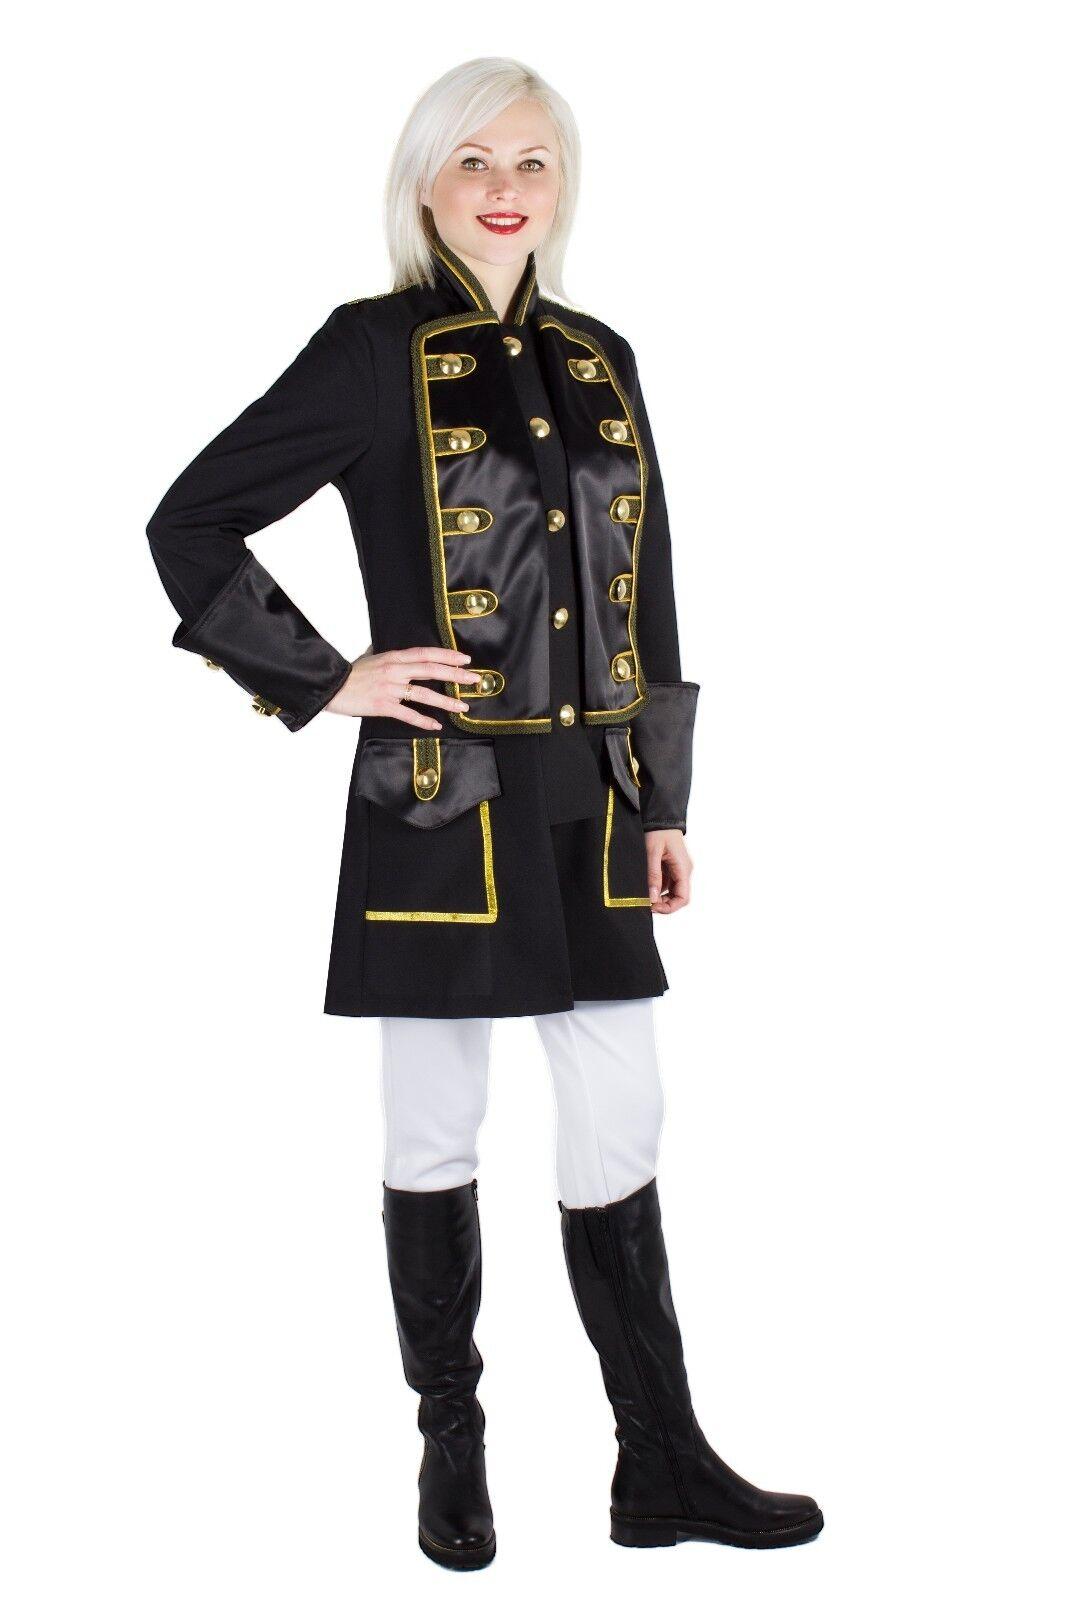 Damen Soldat Piraten Jacke Karnevalskostüm Uniform Fasching Gehrock Köln 36-50